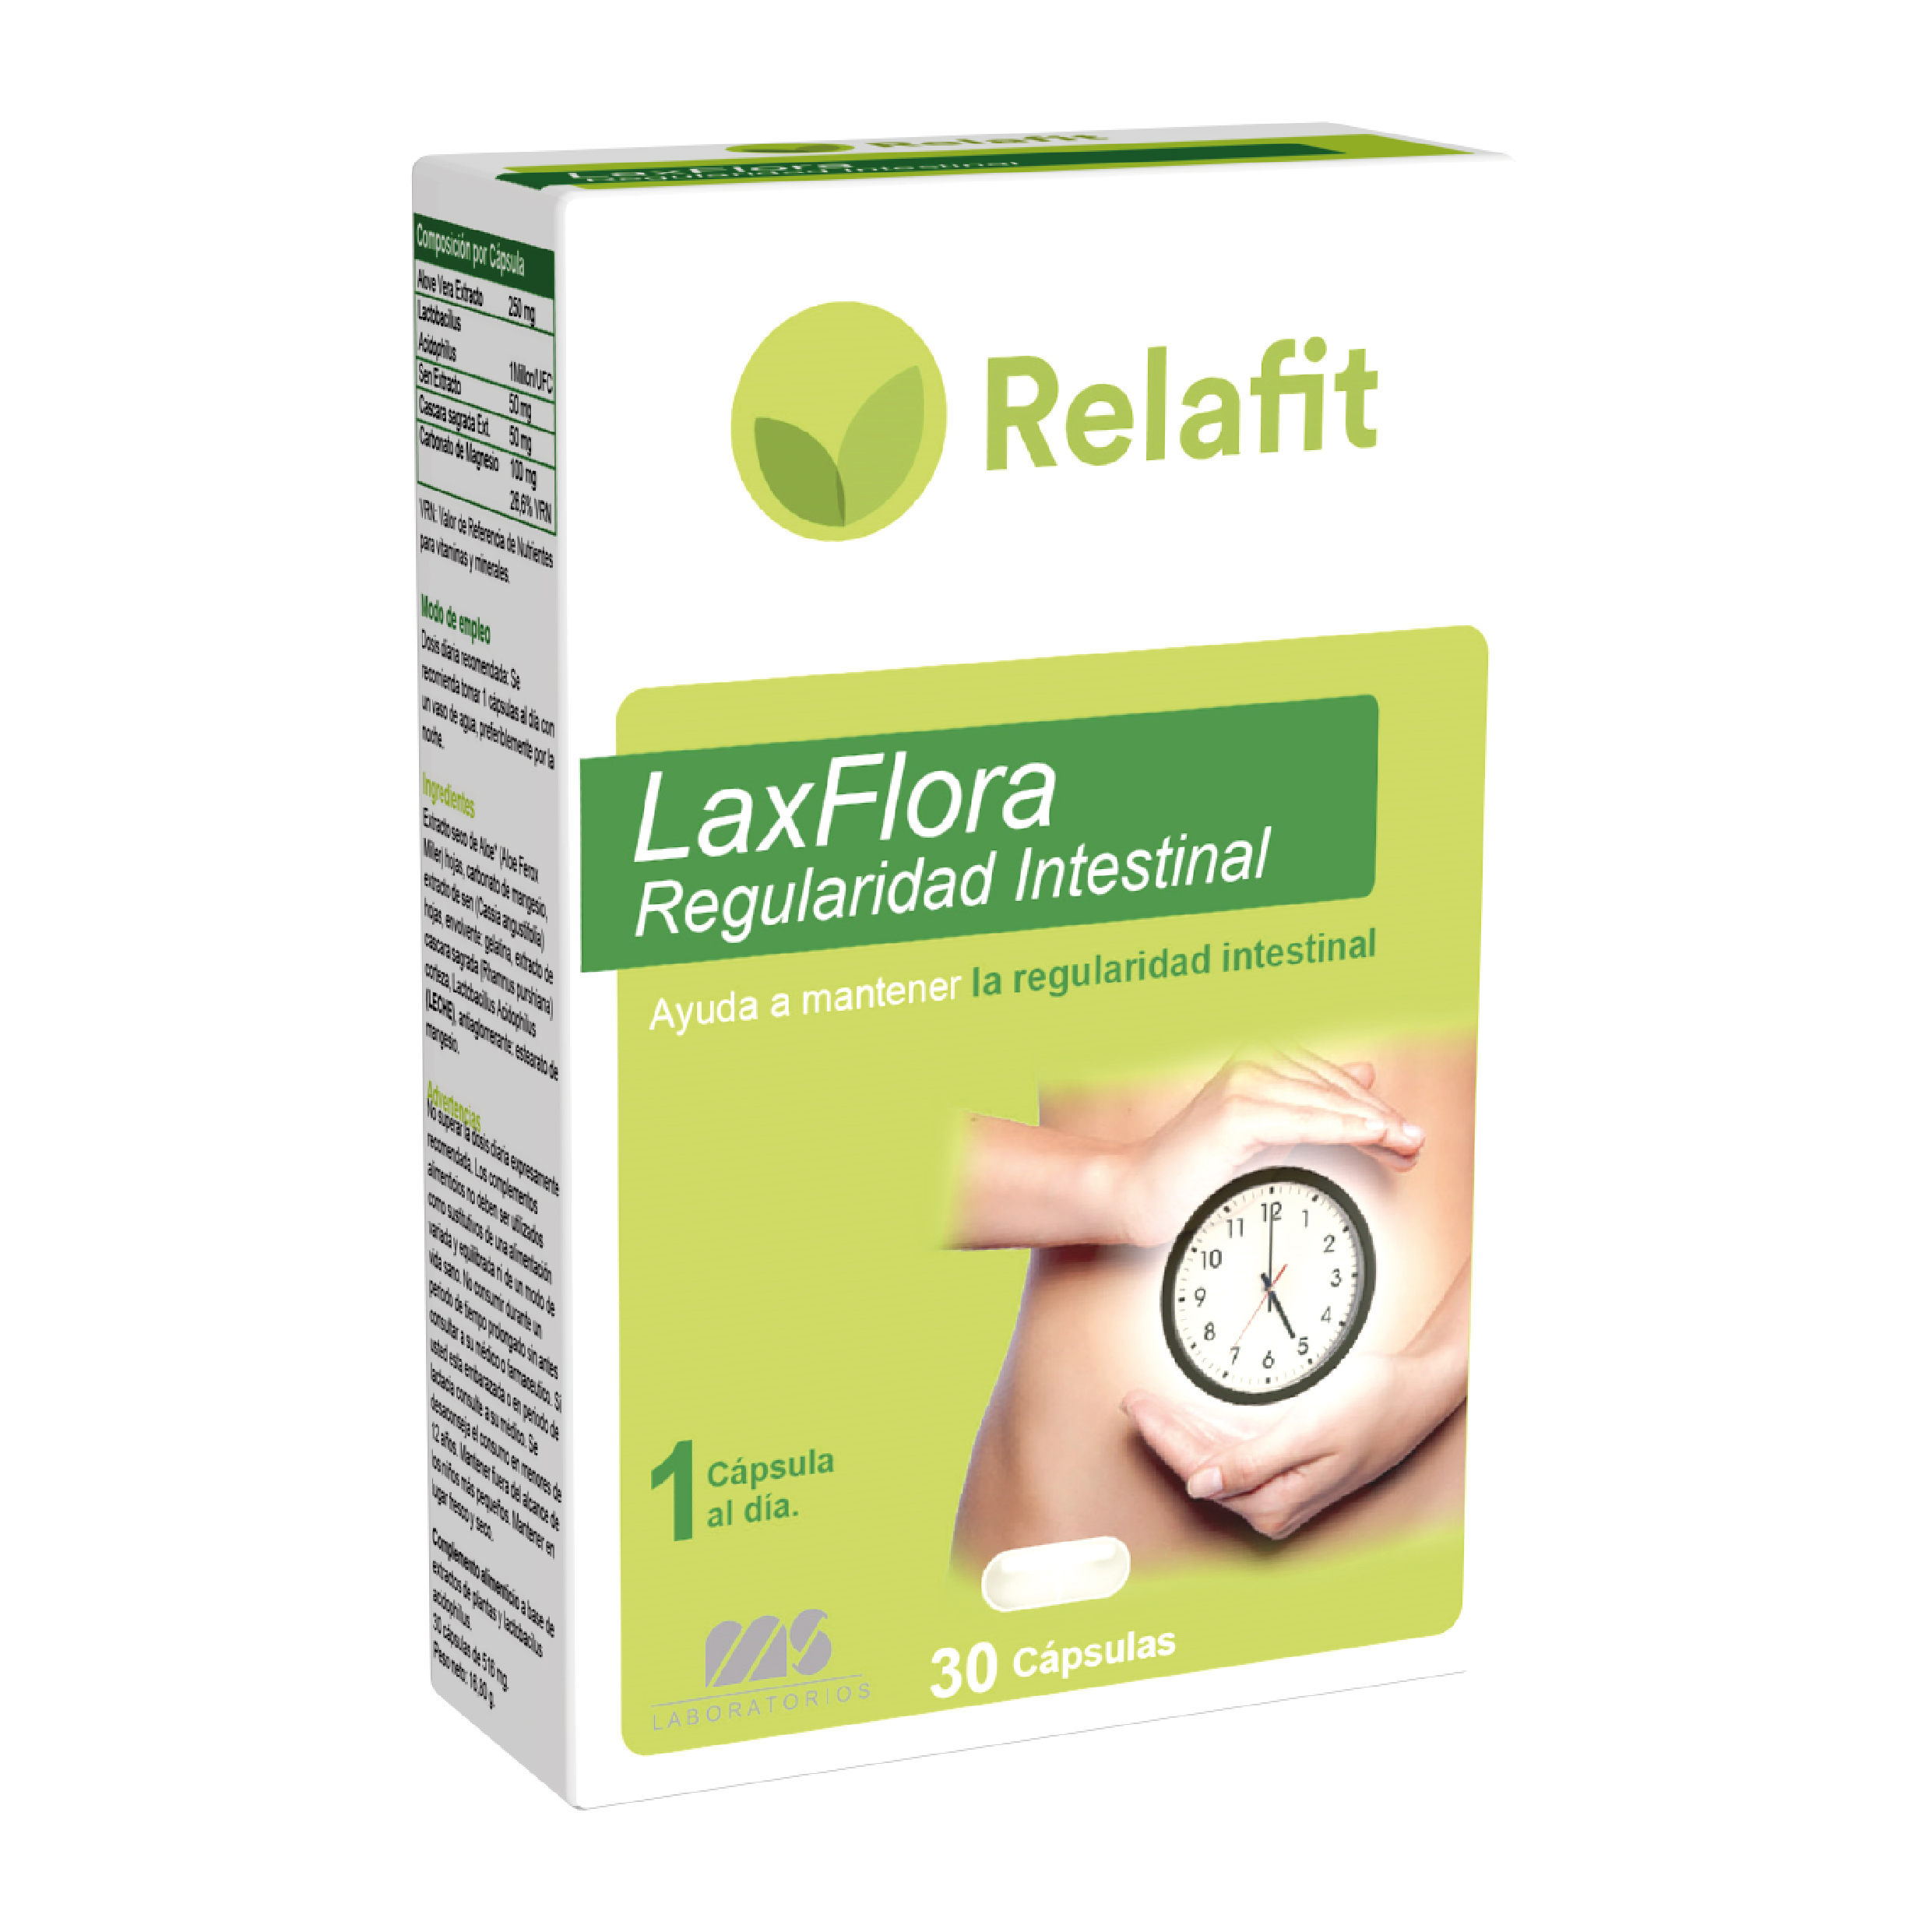 LaxFlora